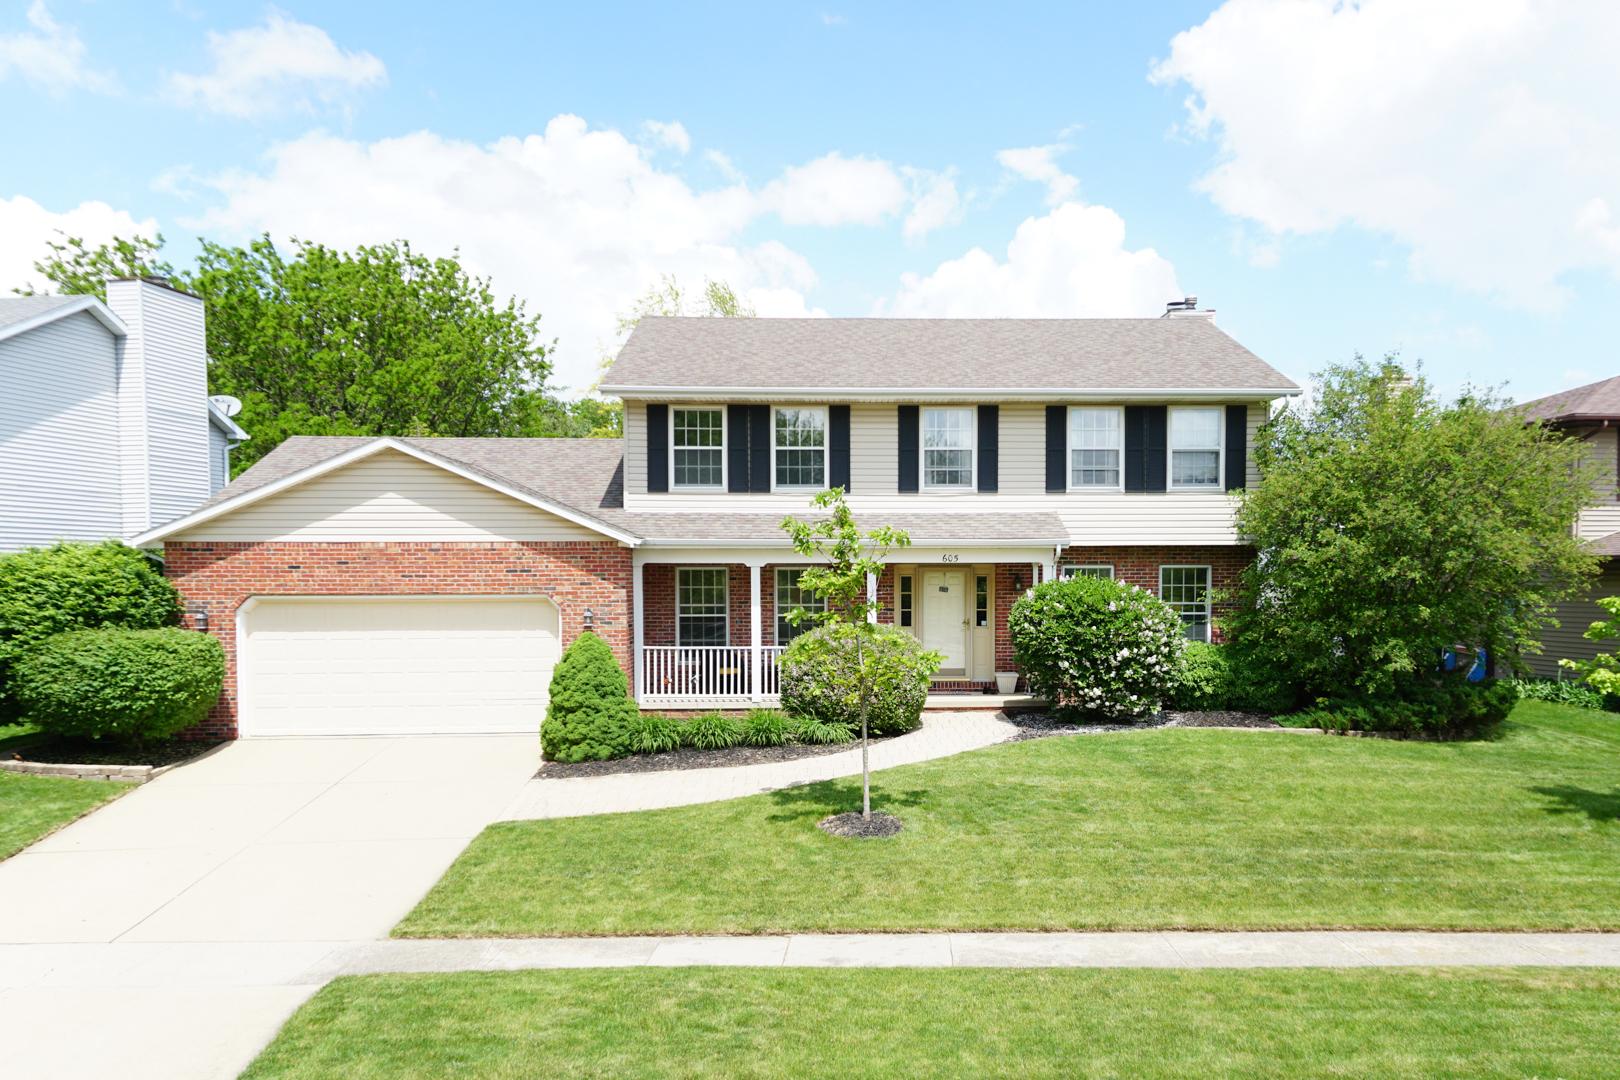 605 Lake Shore Drive, Bloomington IL 61704 – SOLD!